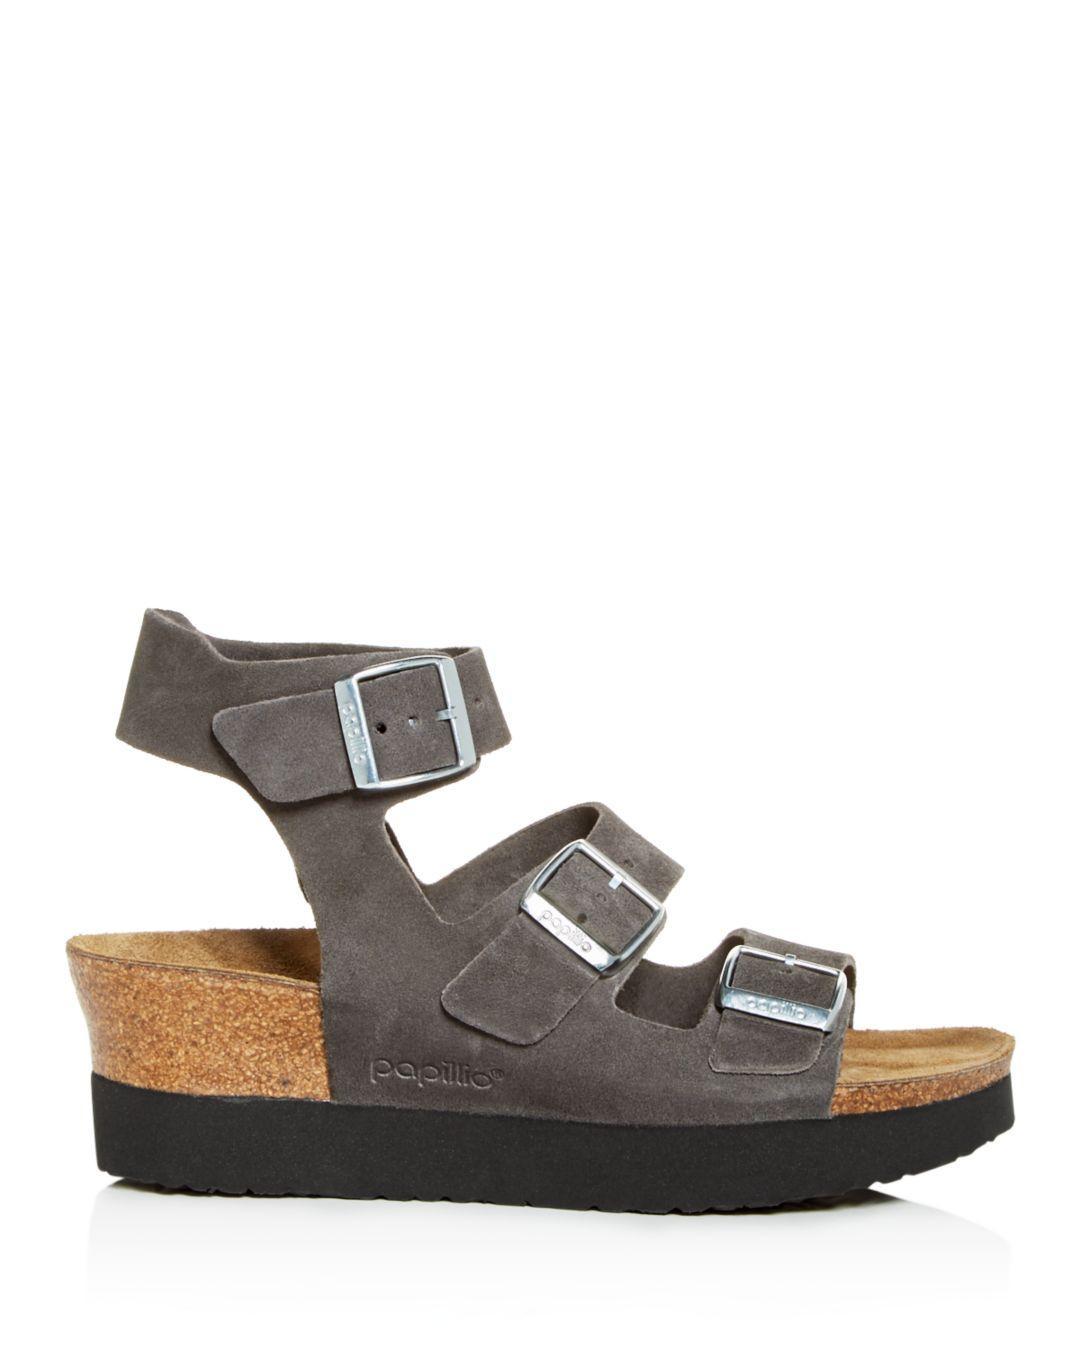 cbb130f6673f Lyst - Birkenstock Women s Linnea Papillio Platform Wedge Sandals in Gray